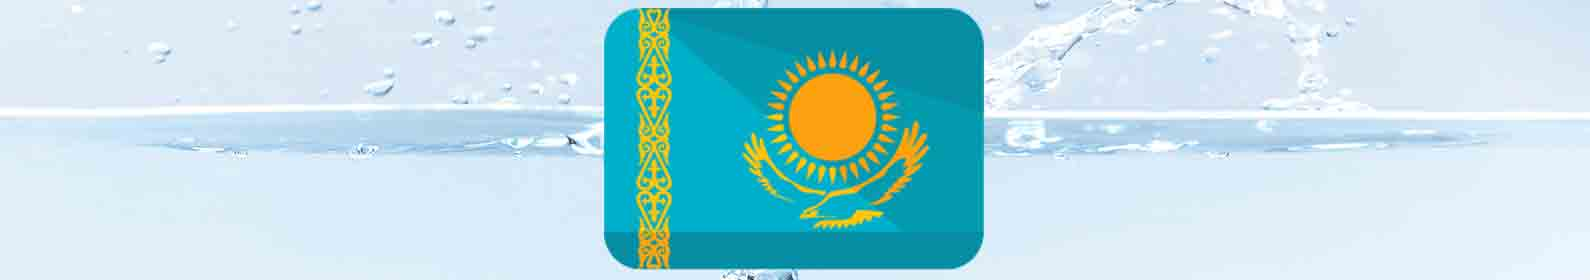 water-treatment-kazakhstan.jpg